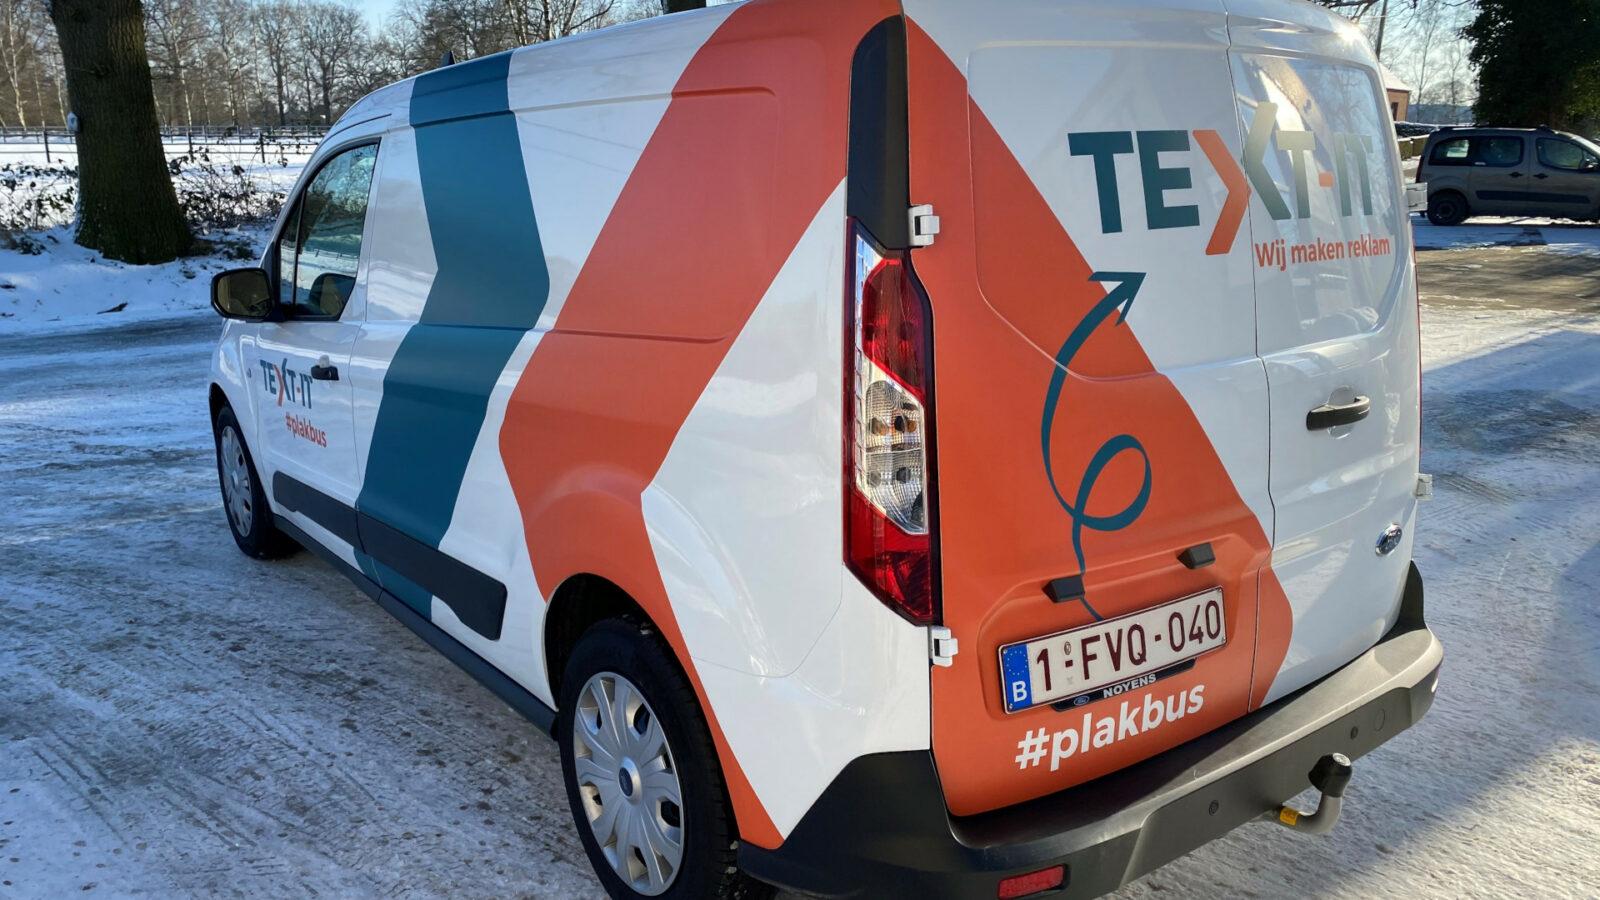 Plakbus - TEXT-IT